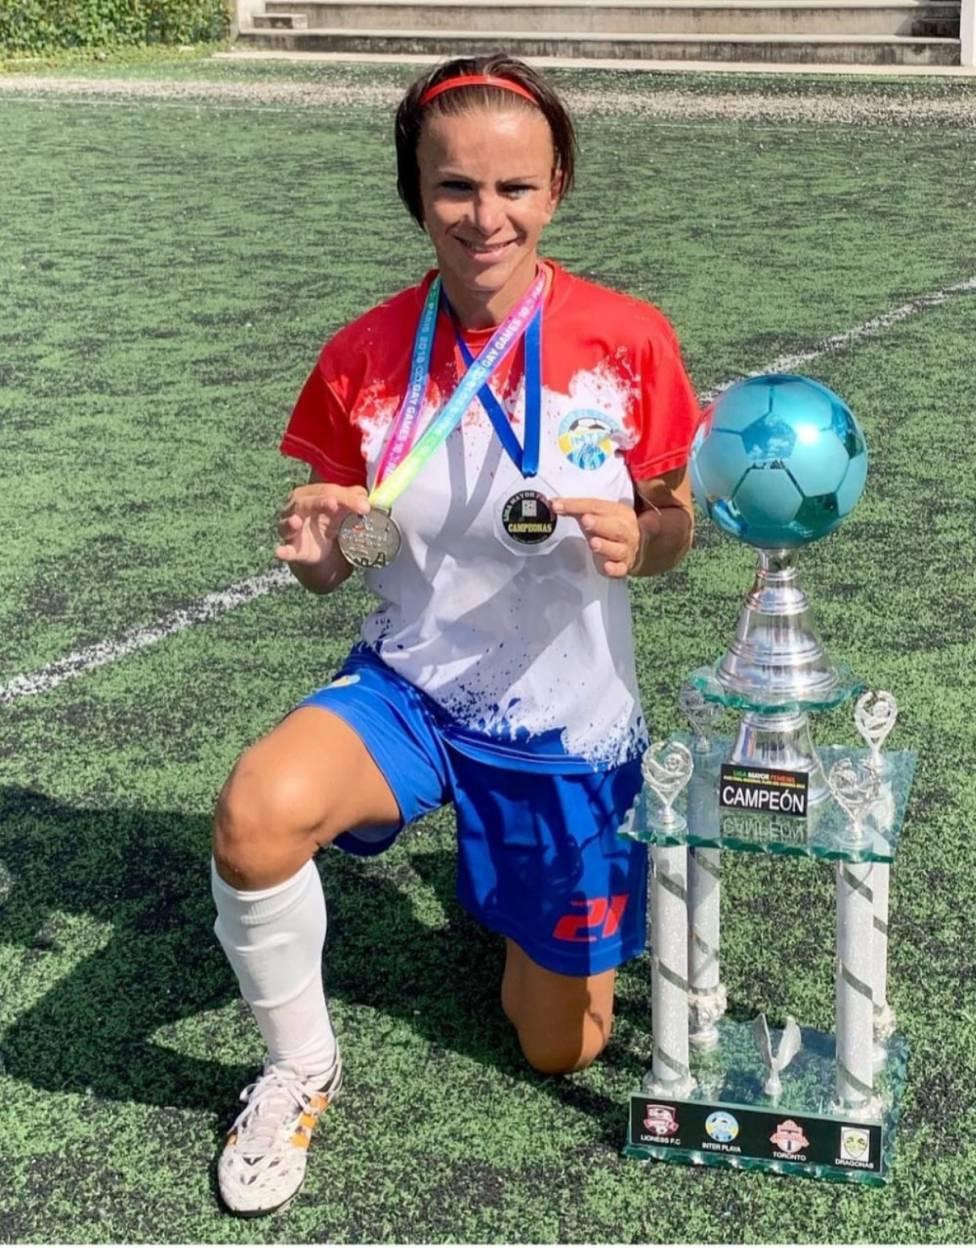 deportistas trans América Latina Miranda Salman Futbolista trans